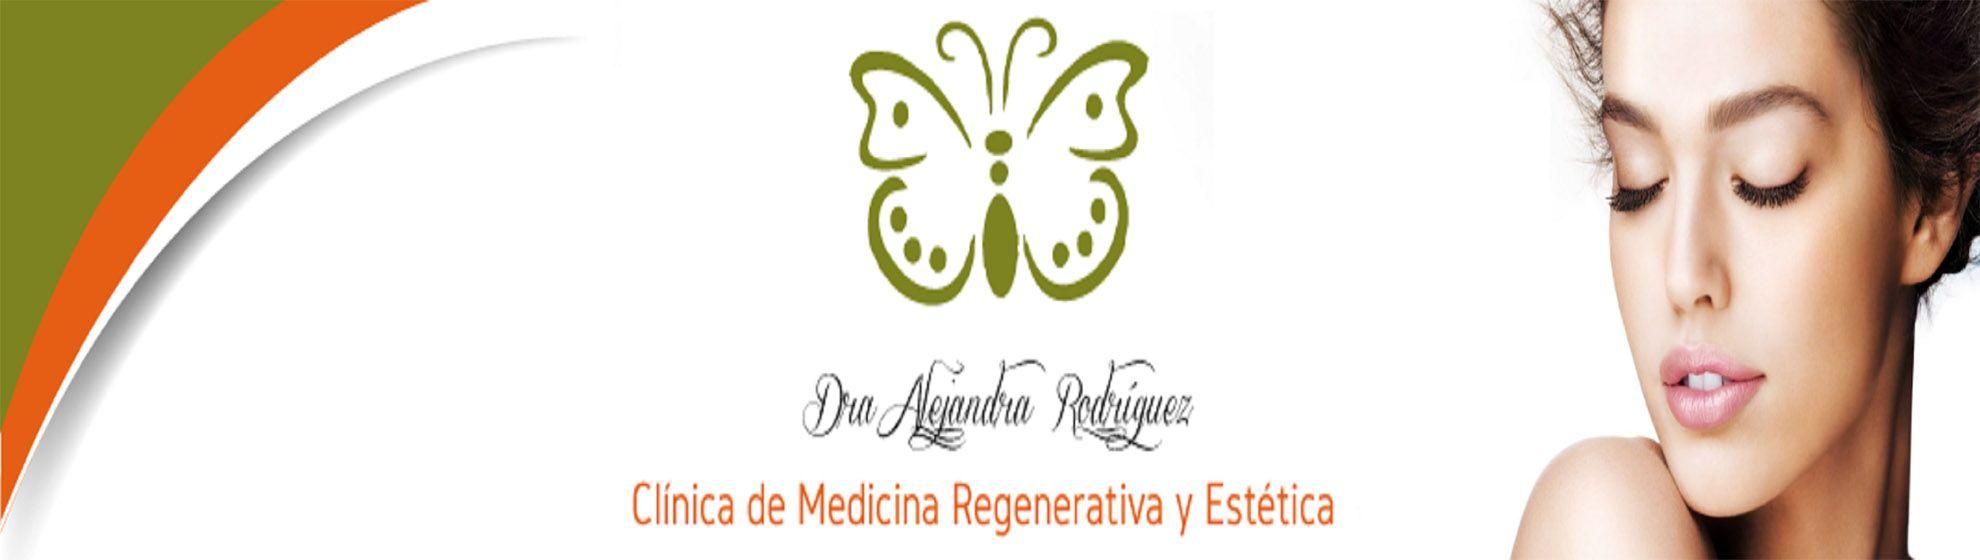 Dra. Alejandra Rodríguez